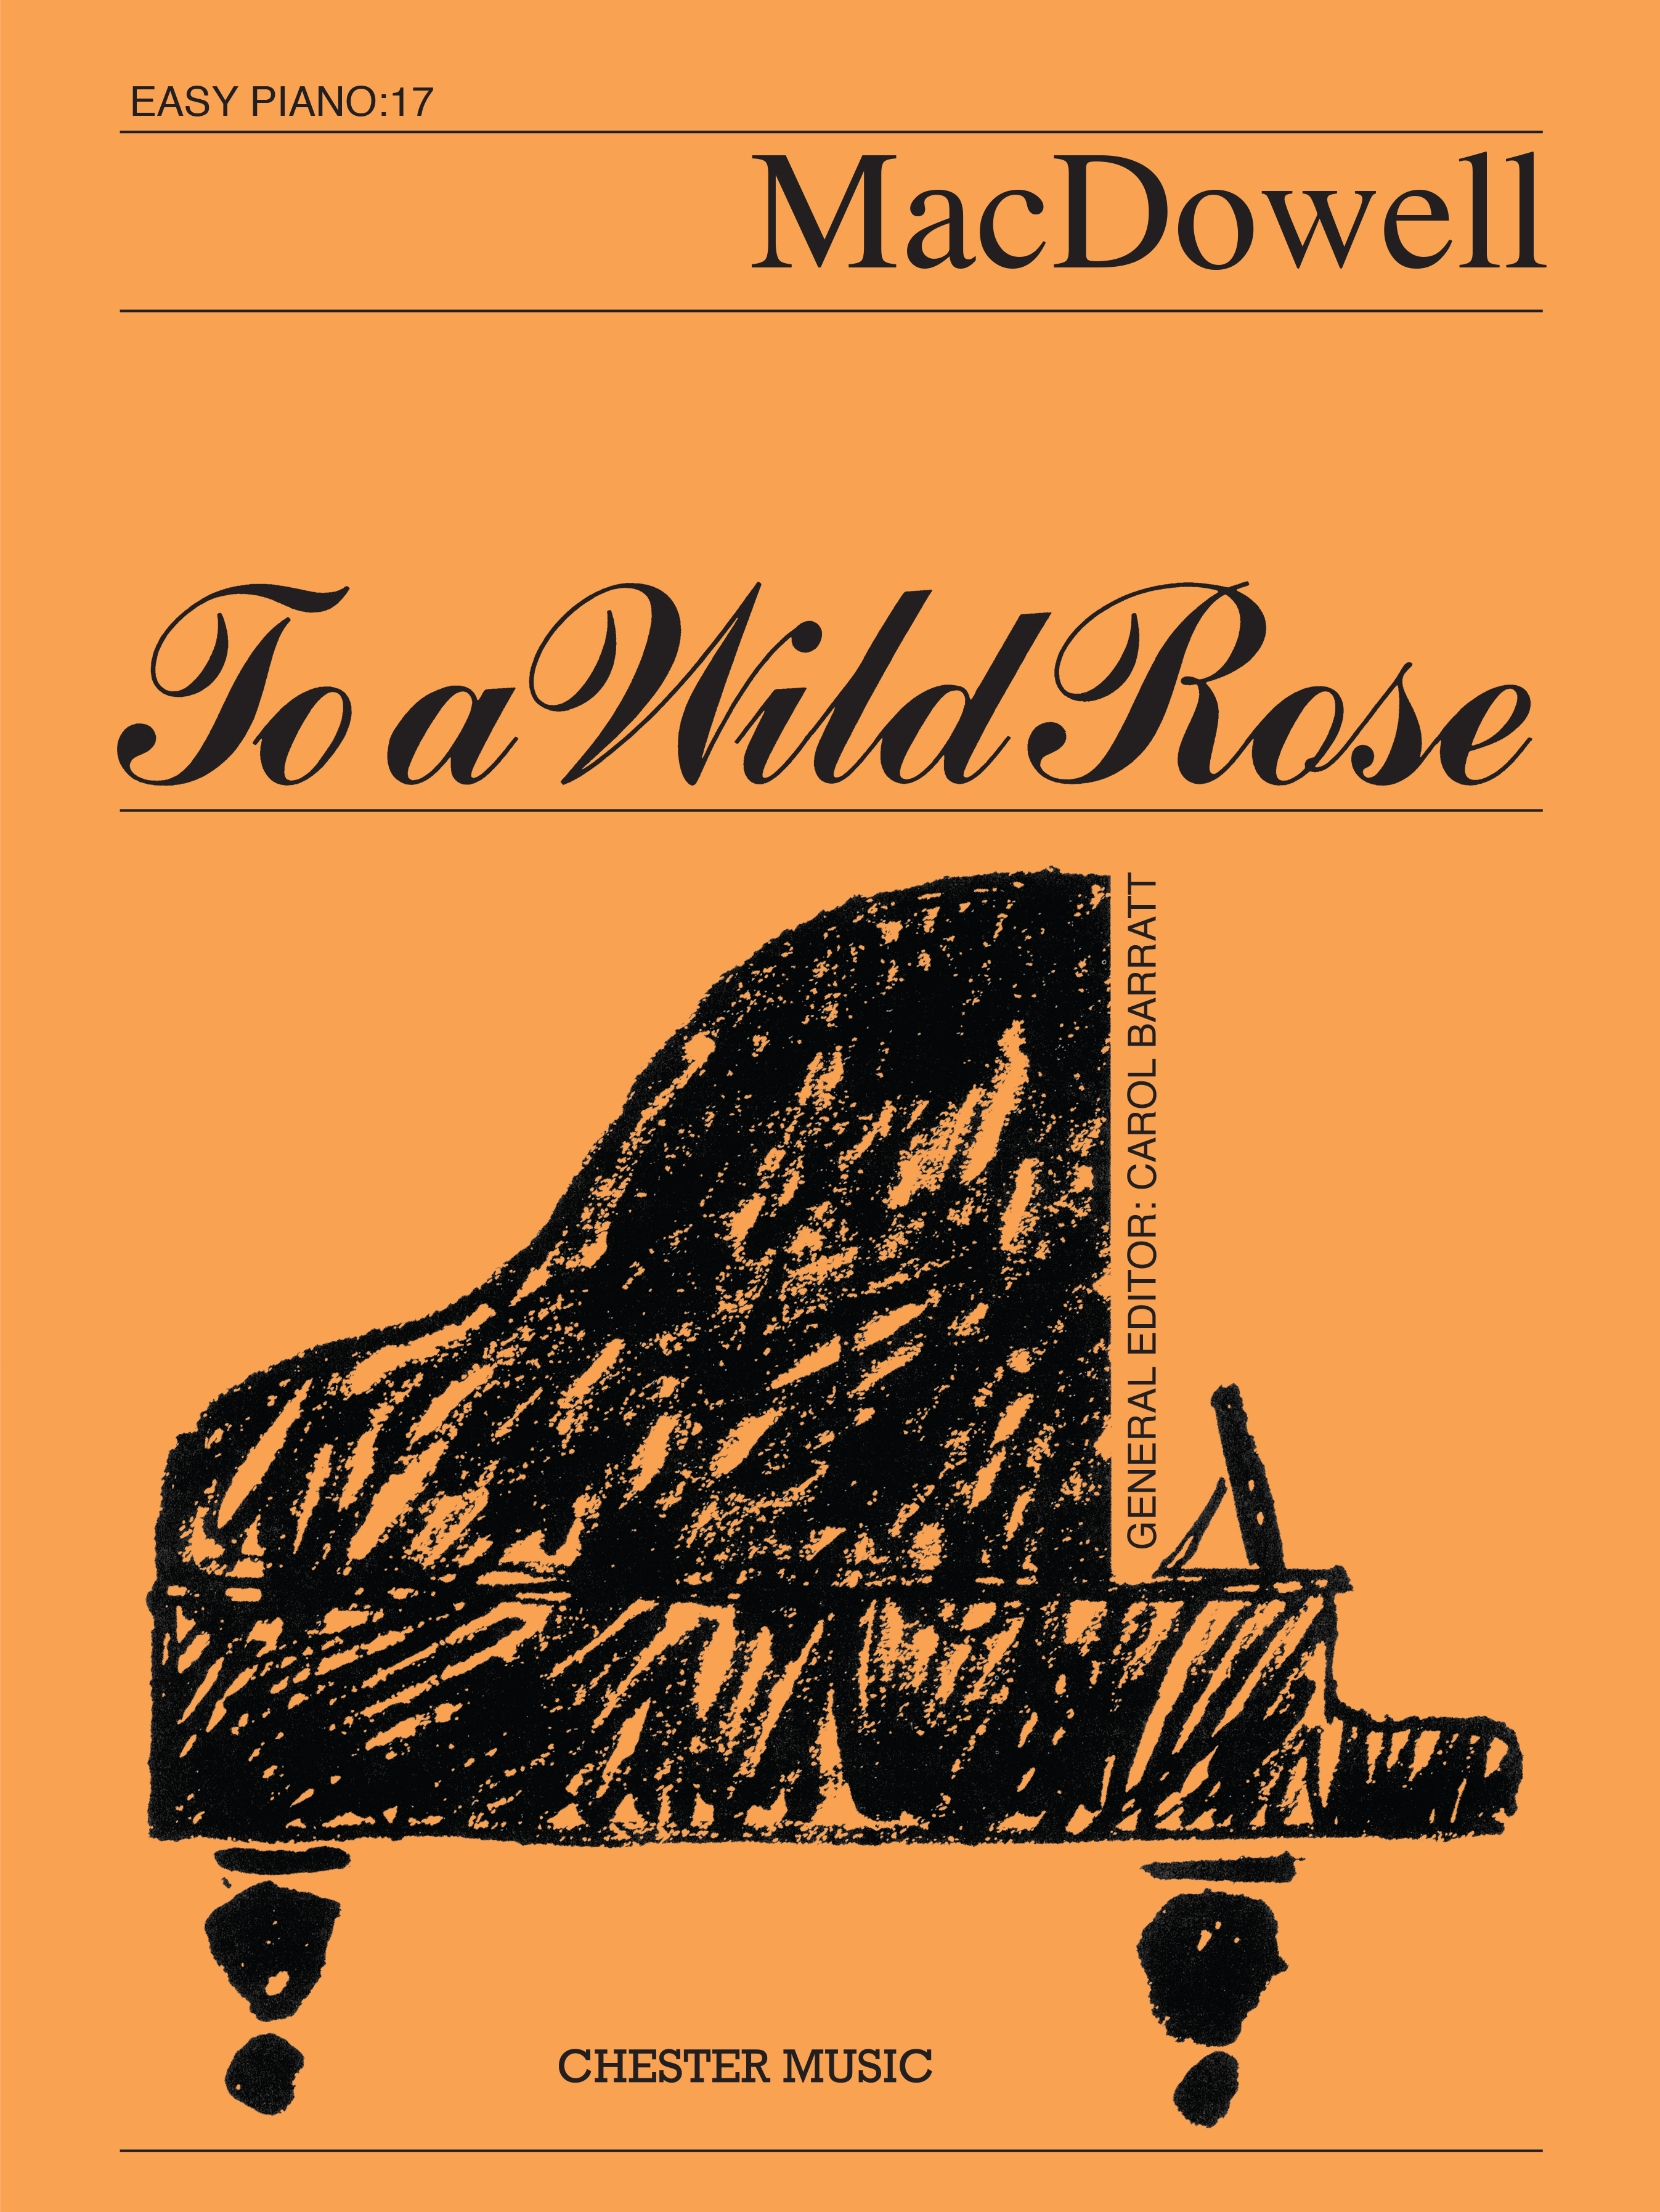 Edward MacDowell: To a Wild Rose (Easy Piano No.17): Easy Piano: Single Sheet